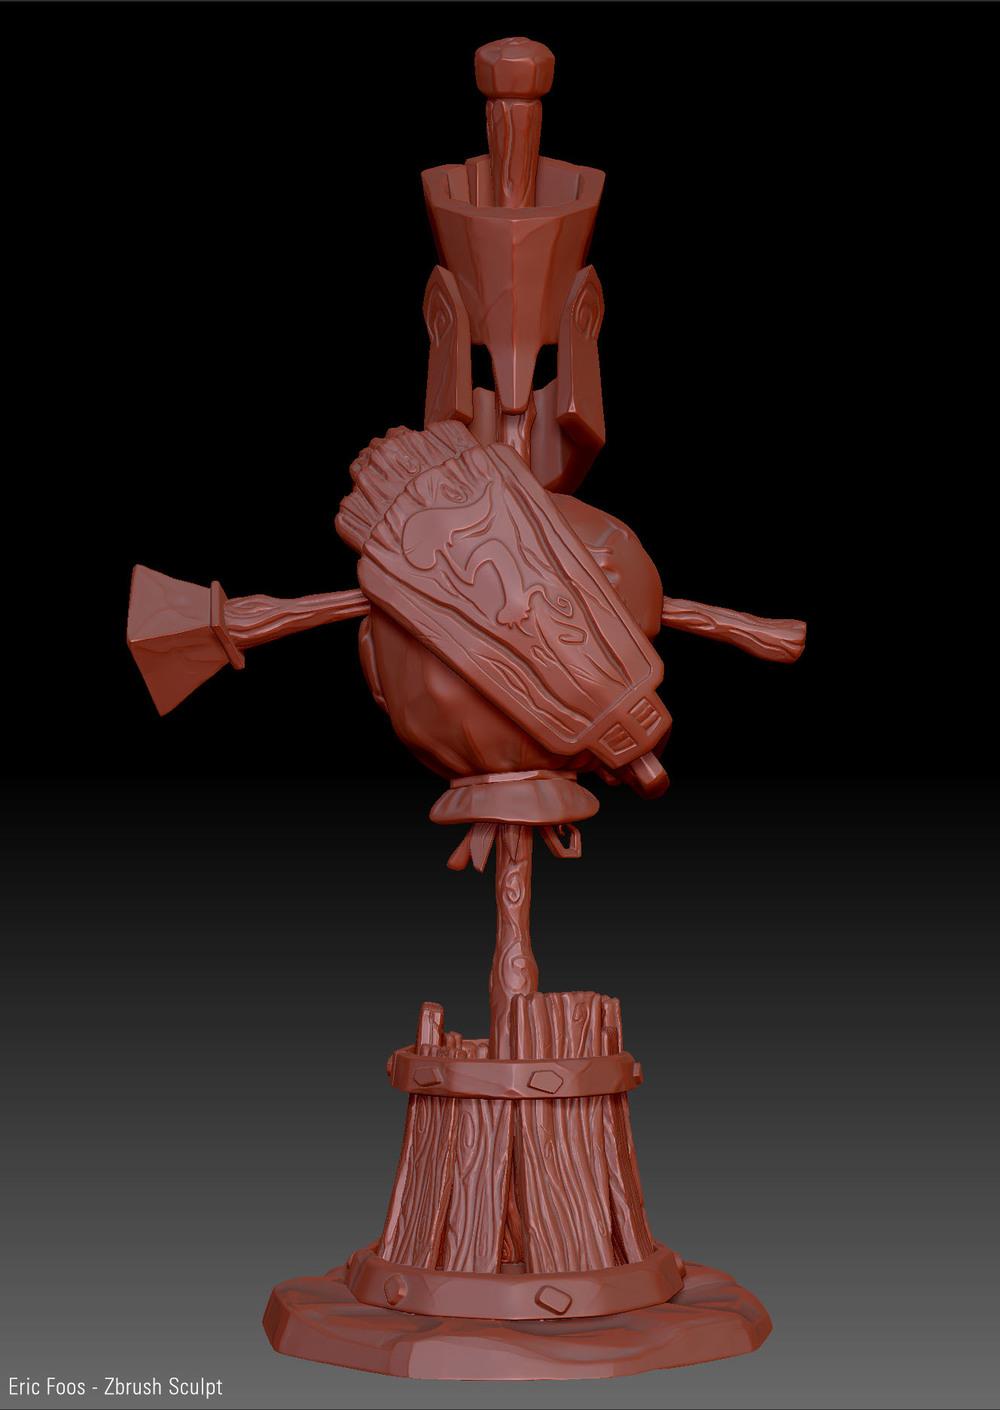 Foos-Zbrush-Sculpt2d.jpg